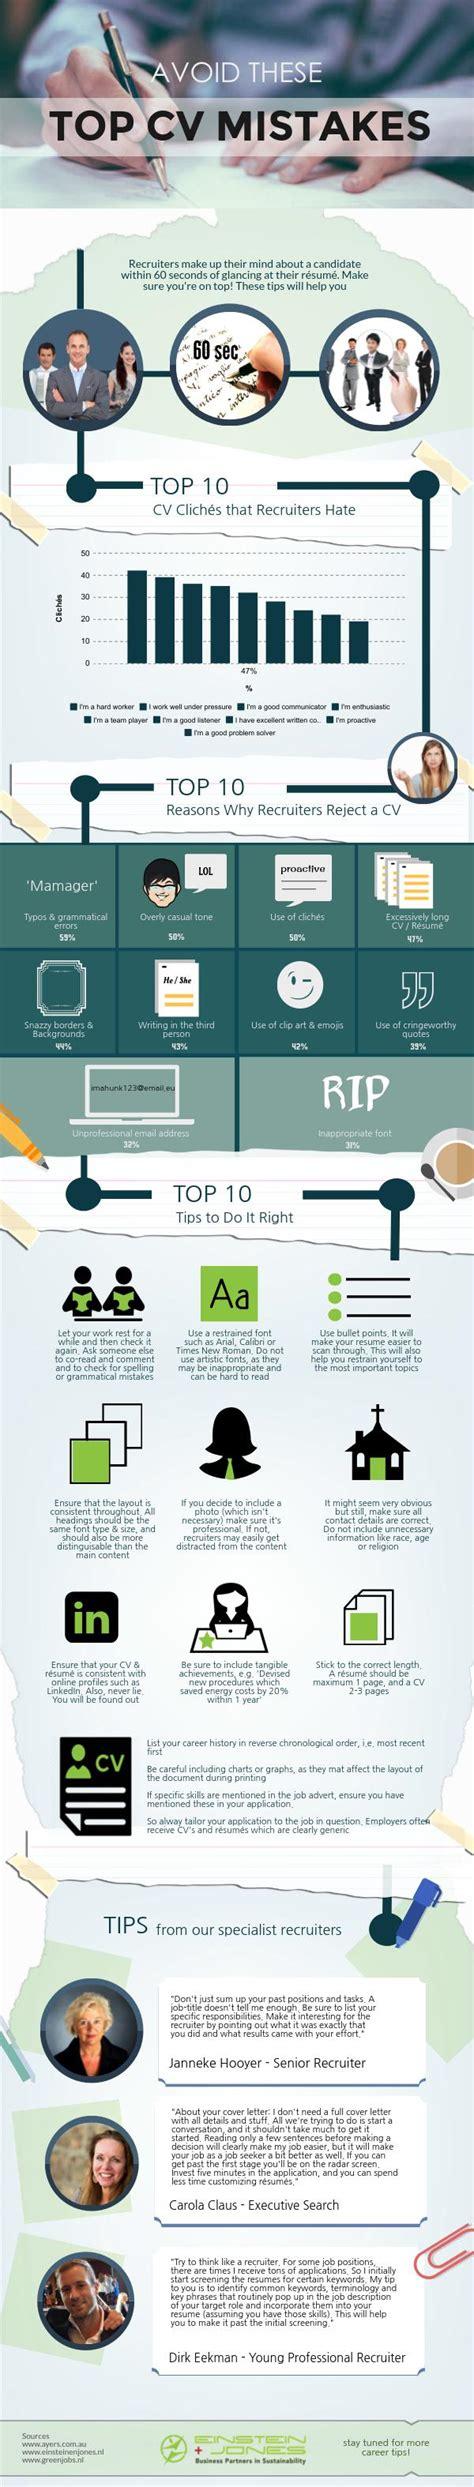 avoid these top cv mistakes piktochart visual editor